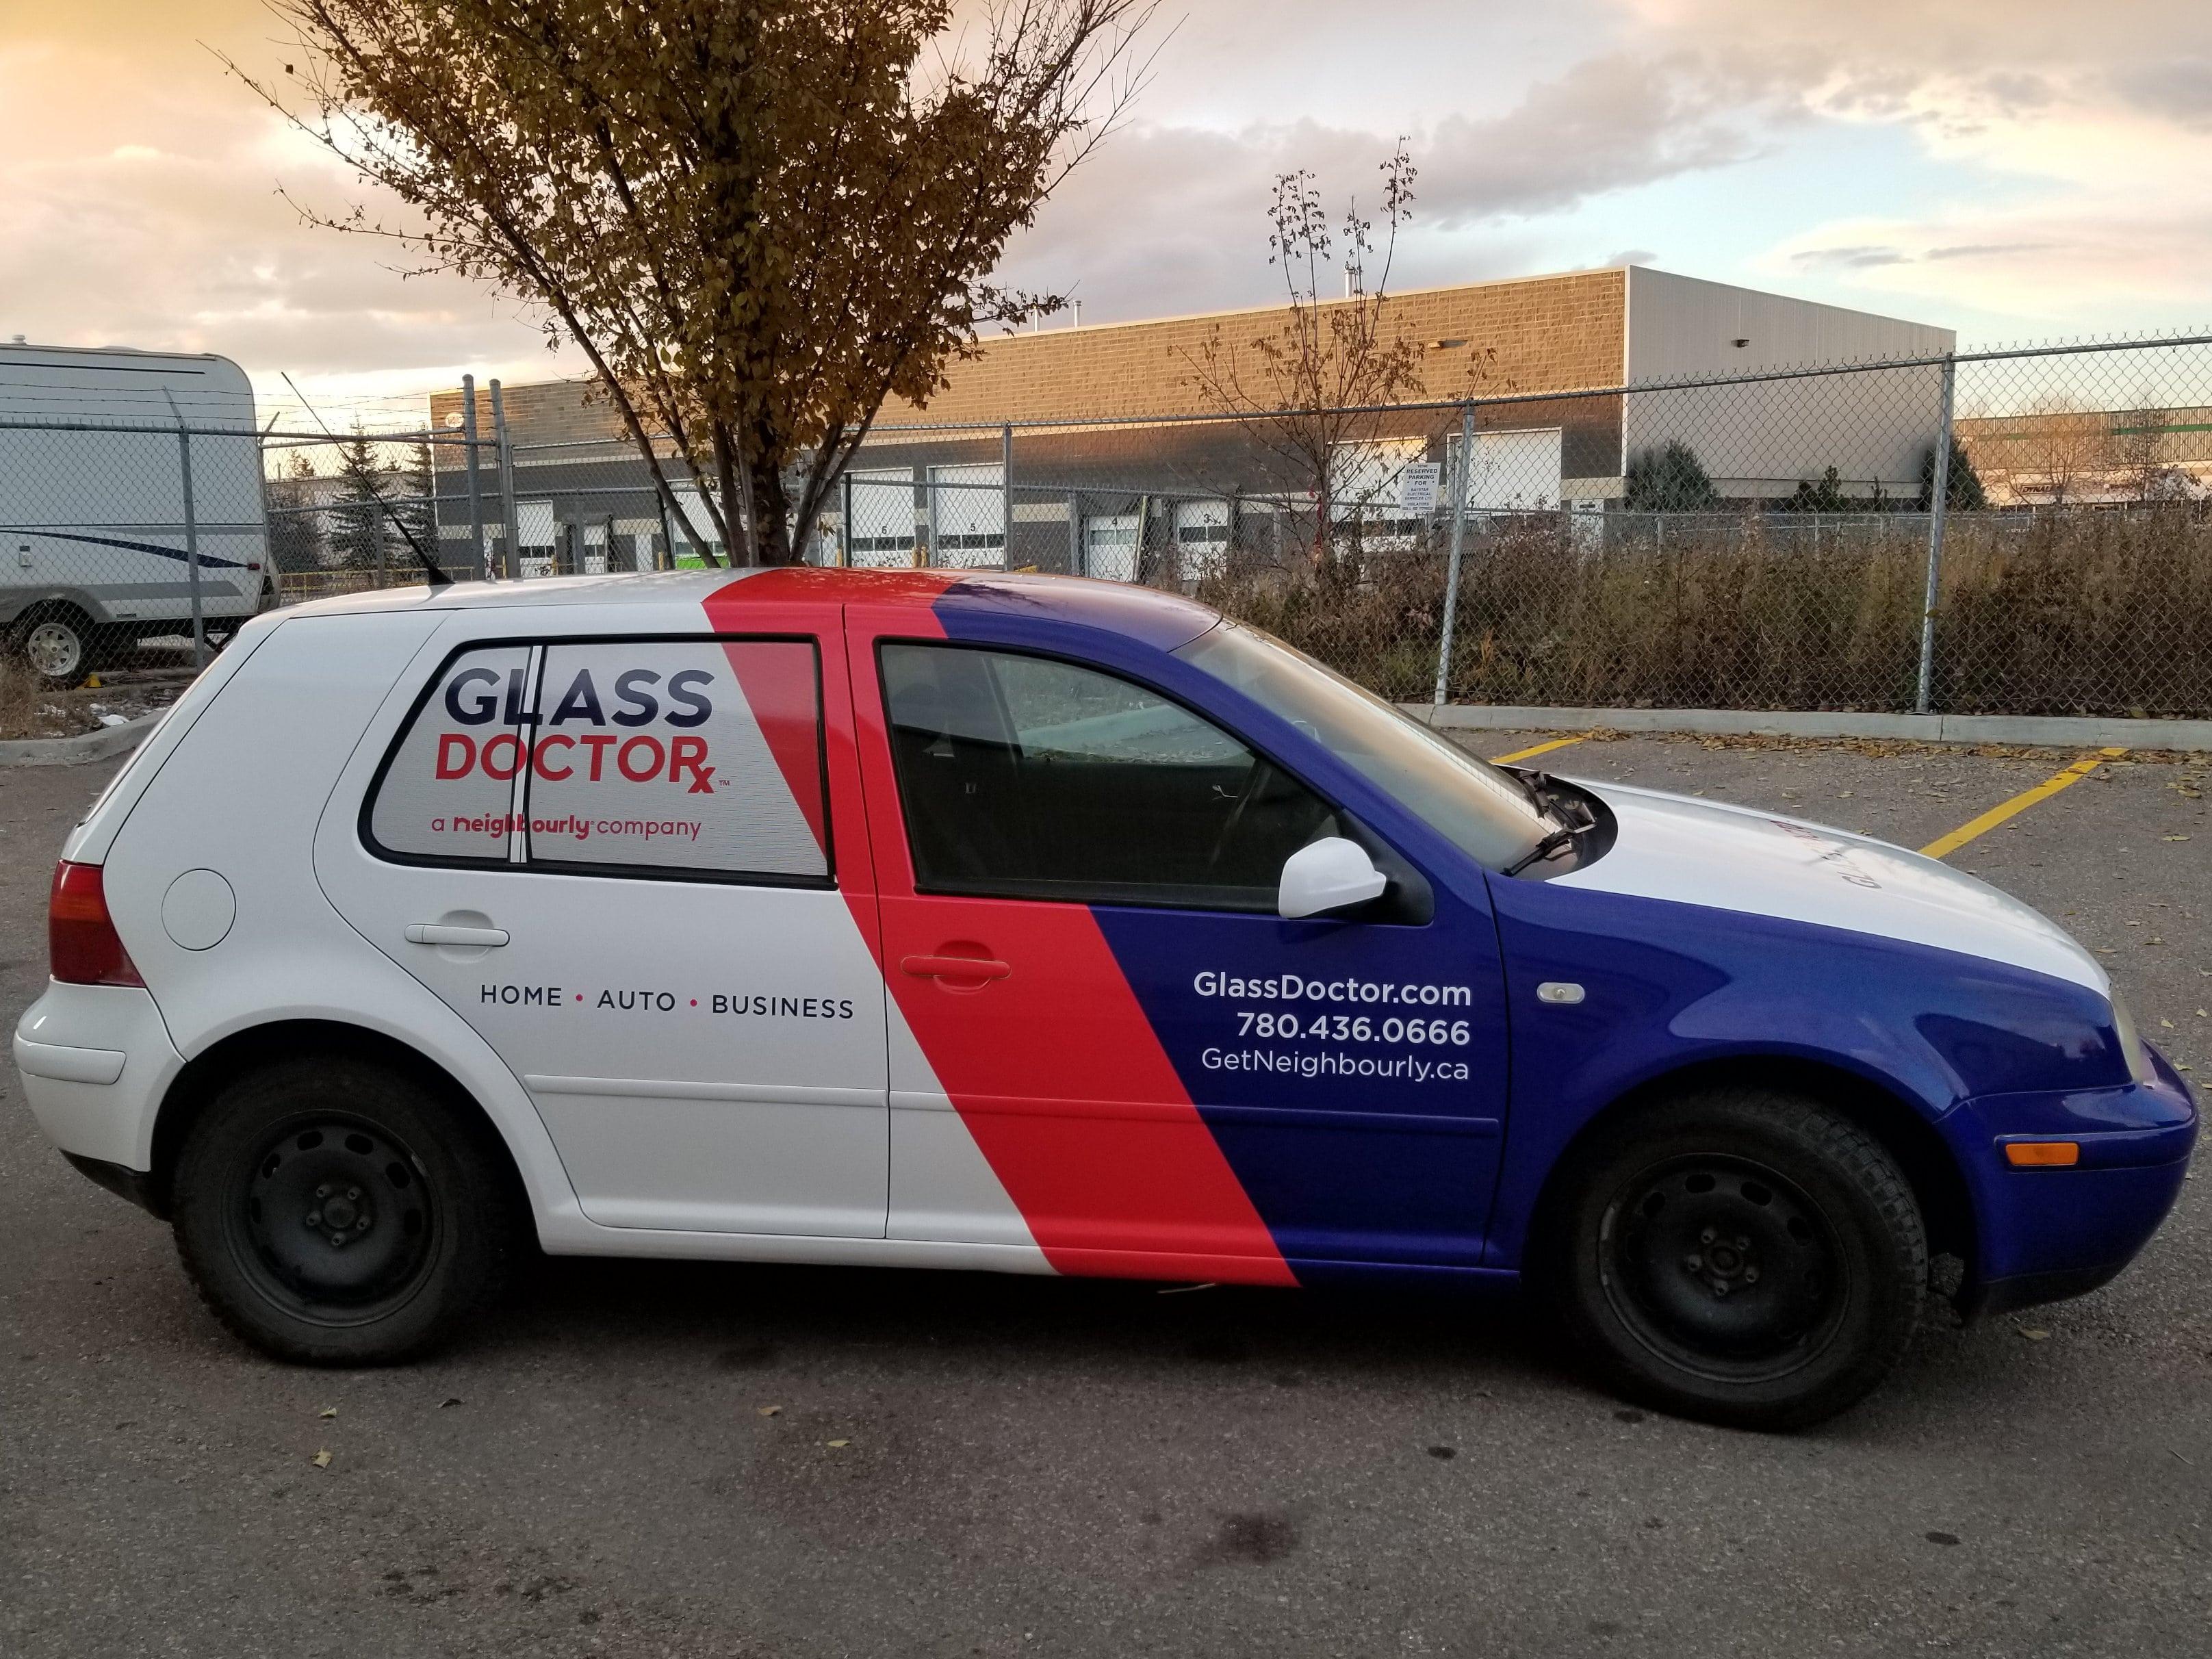 Glass Dr VW full vehicle wrap.